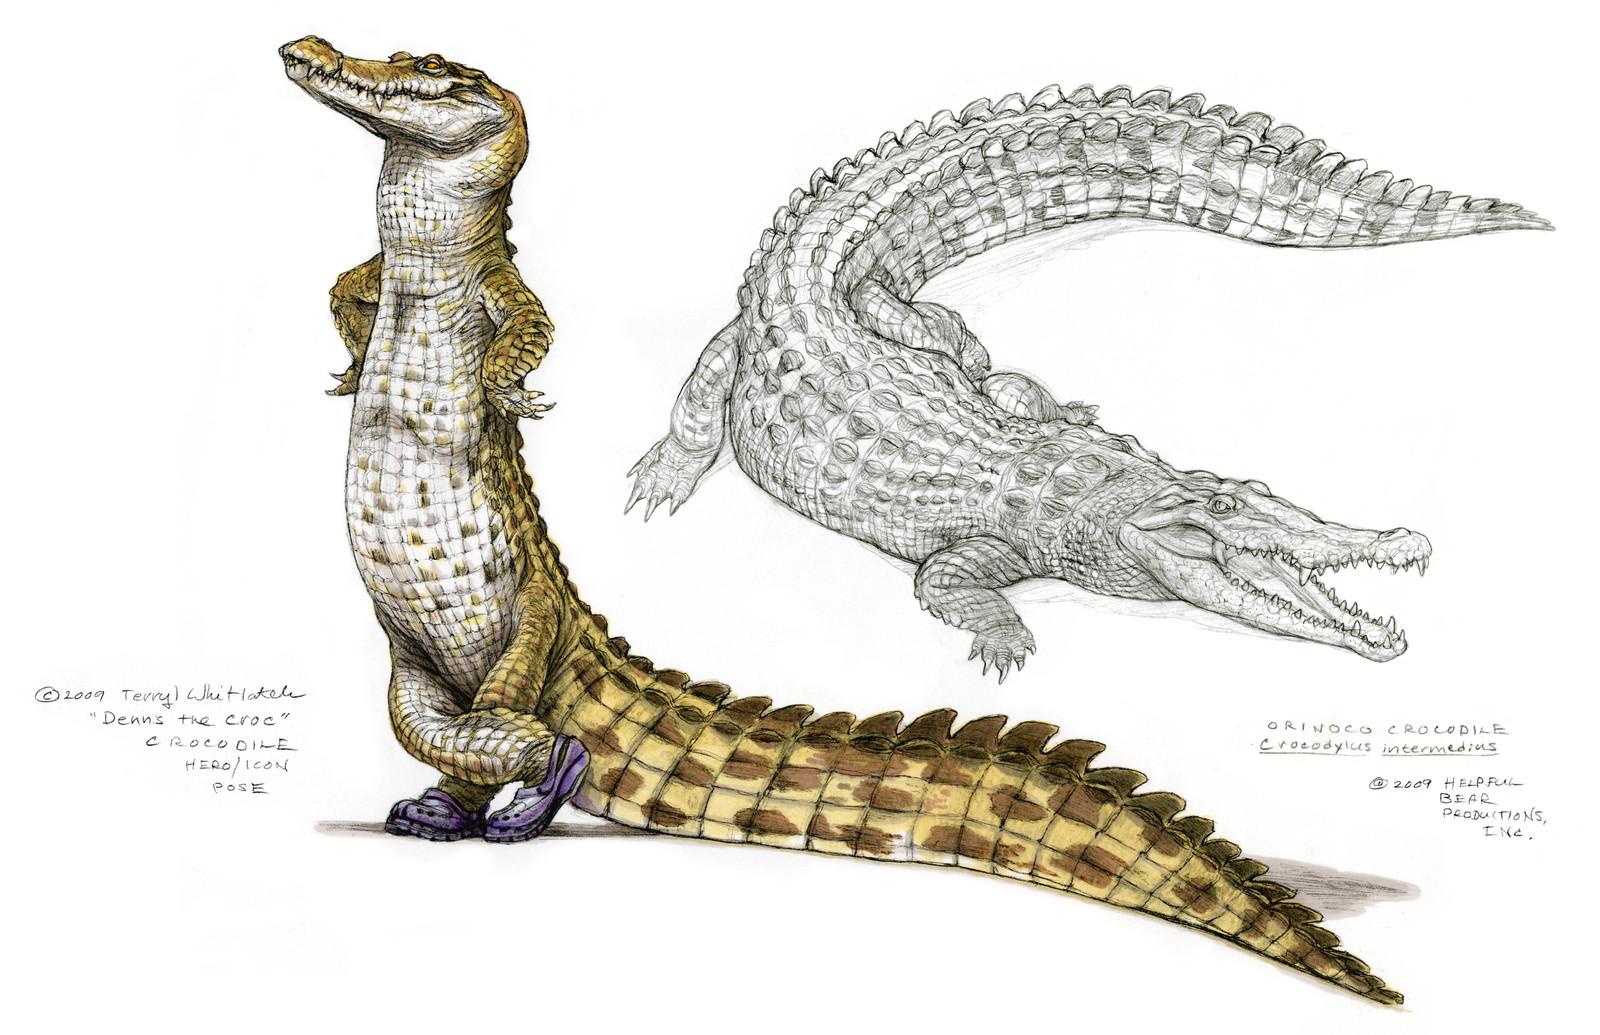 Croc wearing Crocs and crocodile study